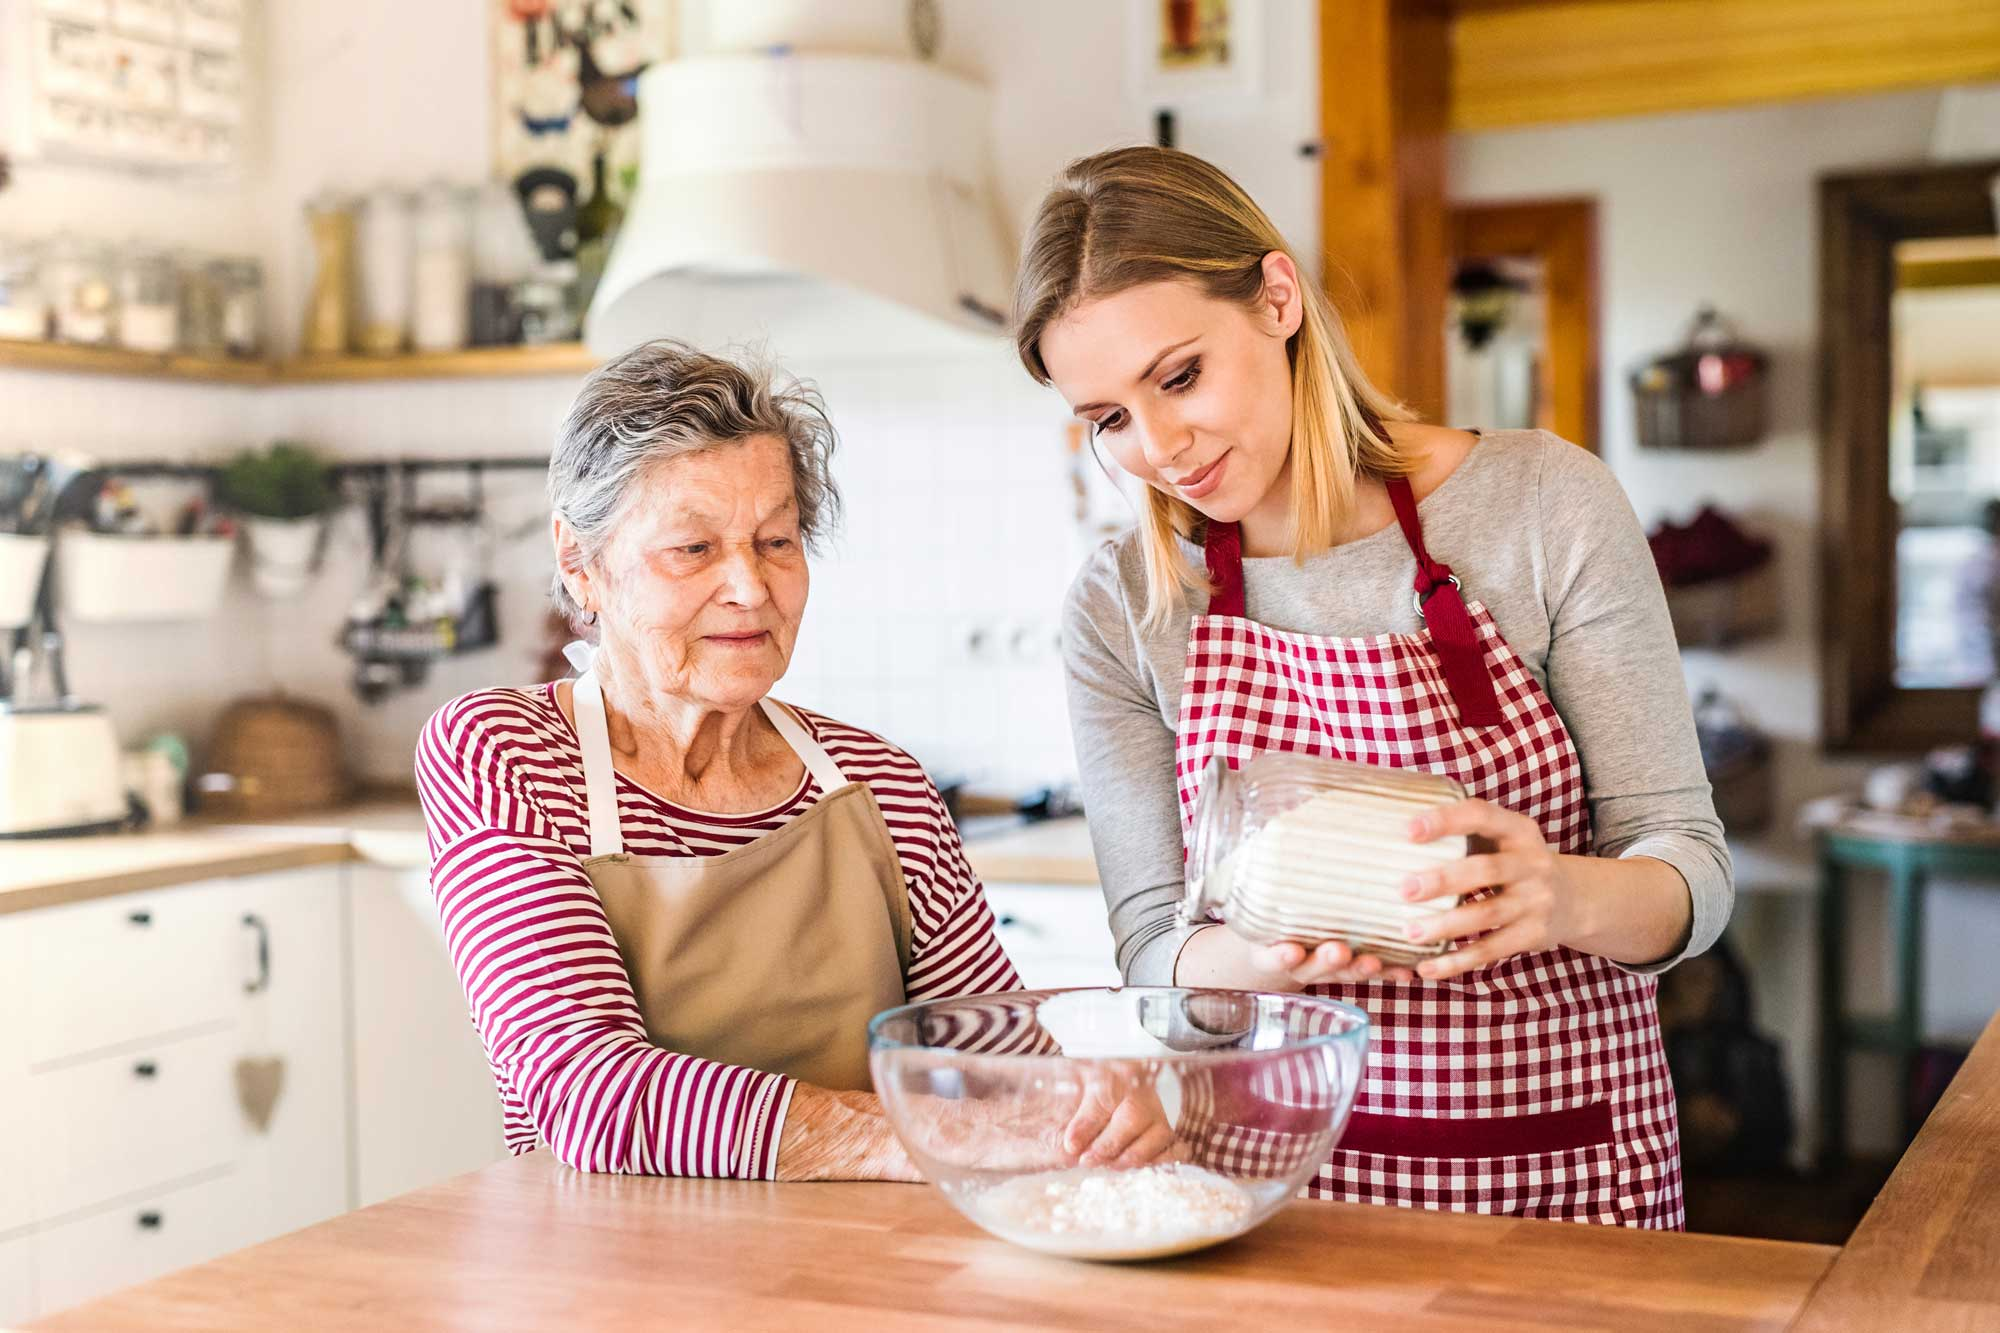 plh-woman-baking